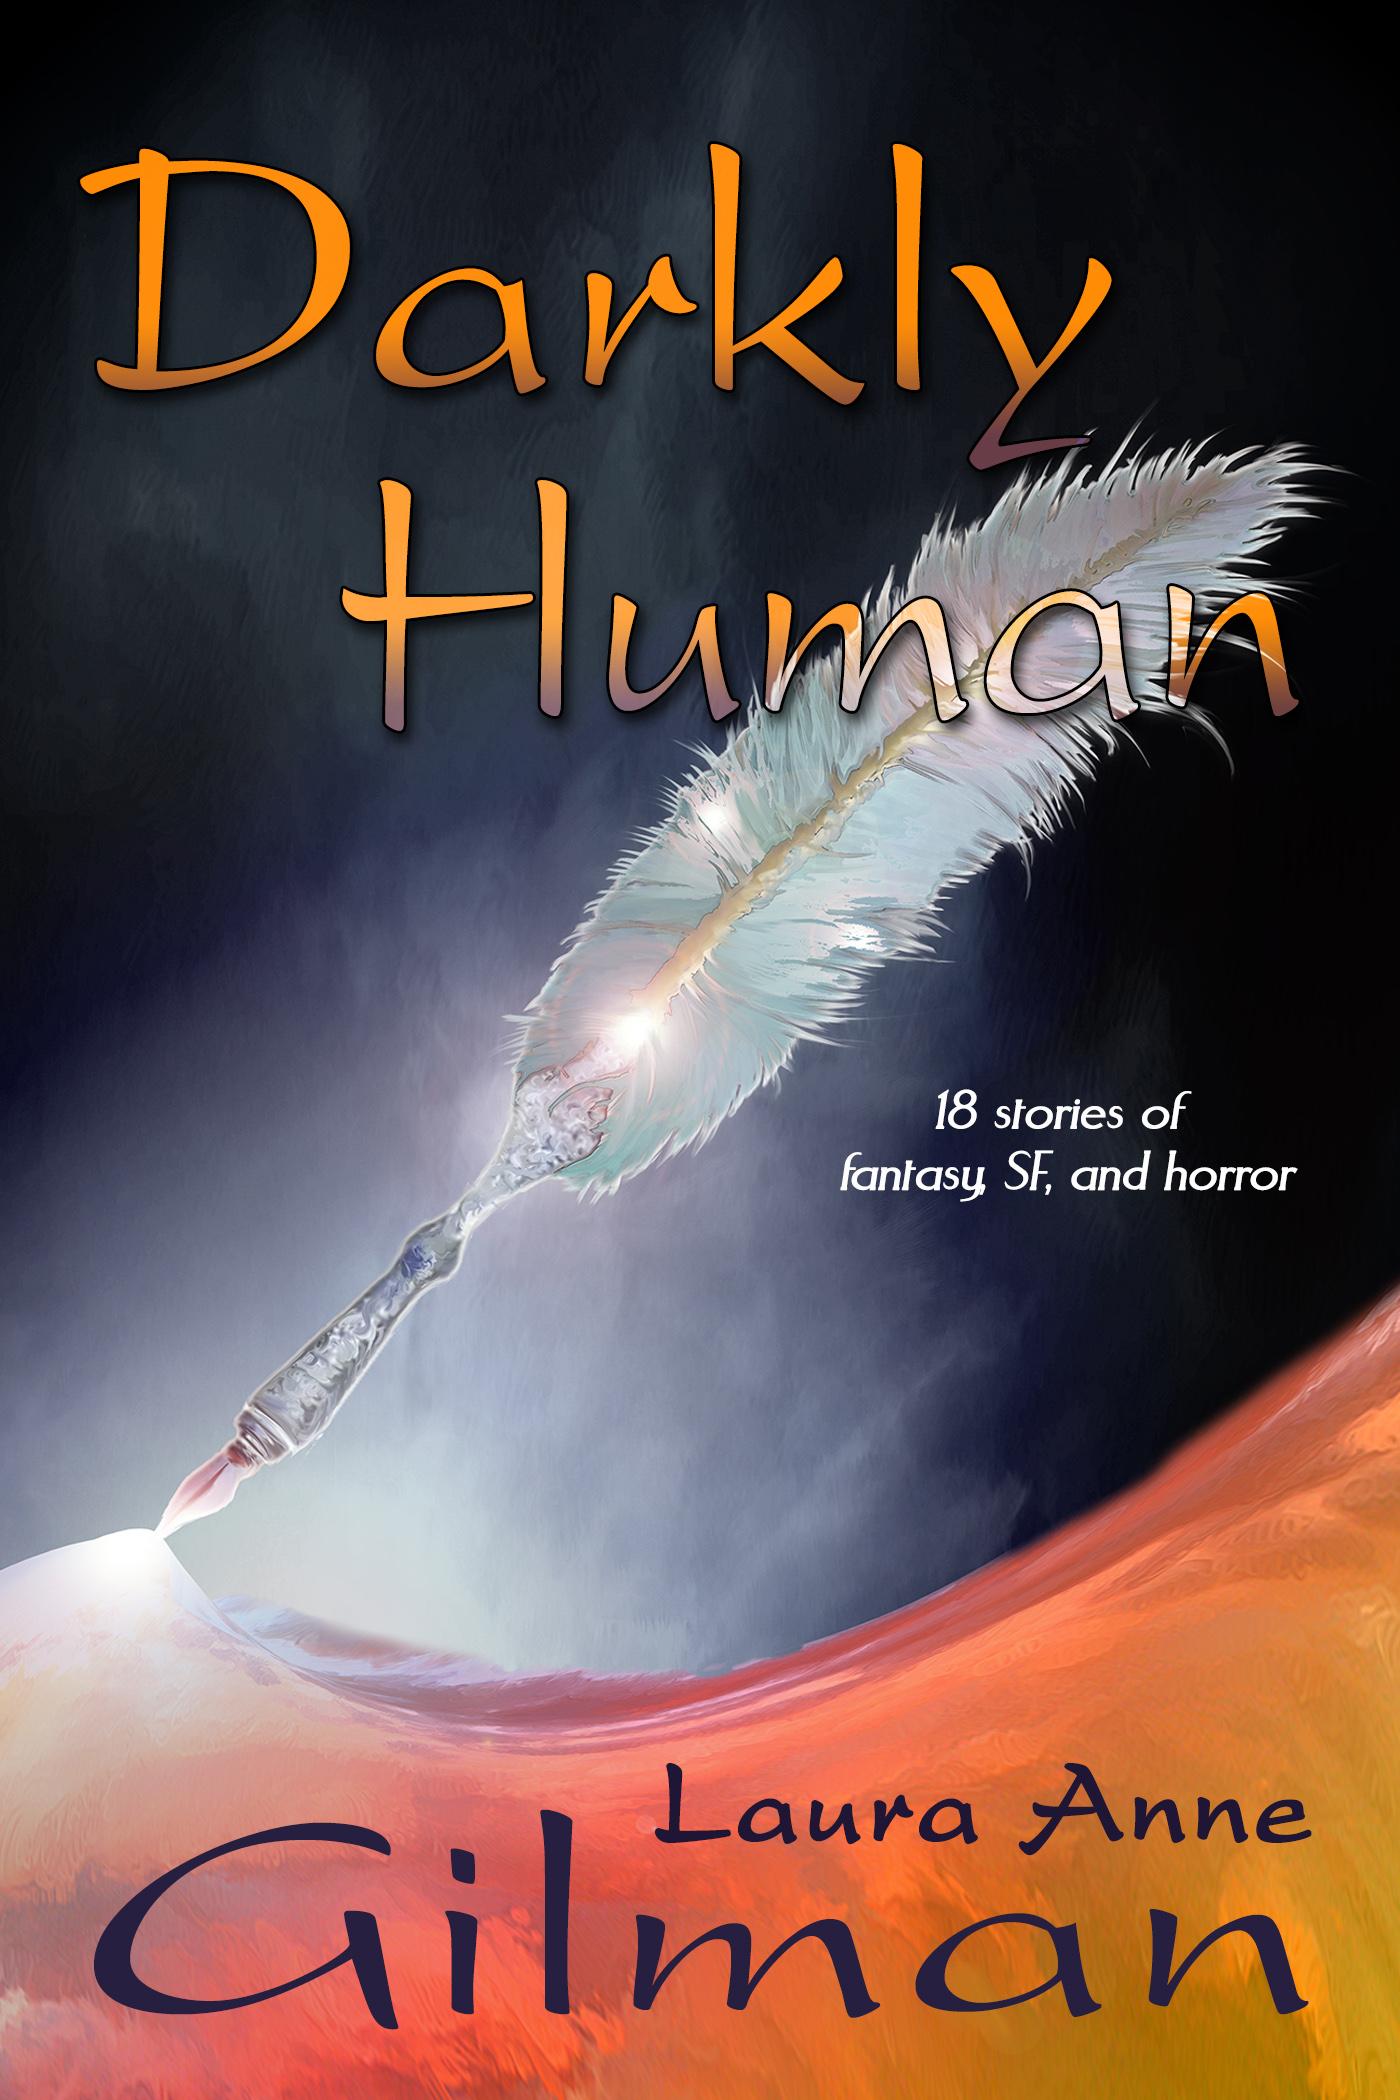 Darkly Human, 2016